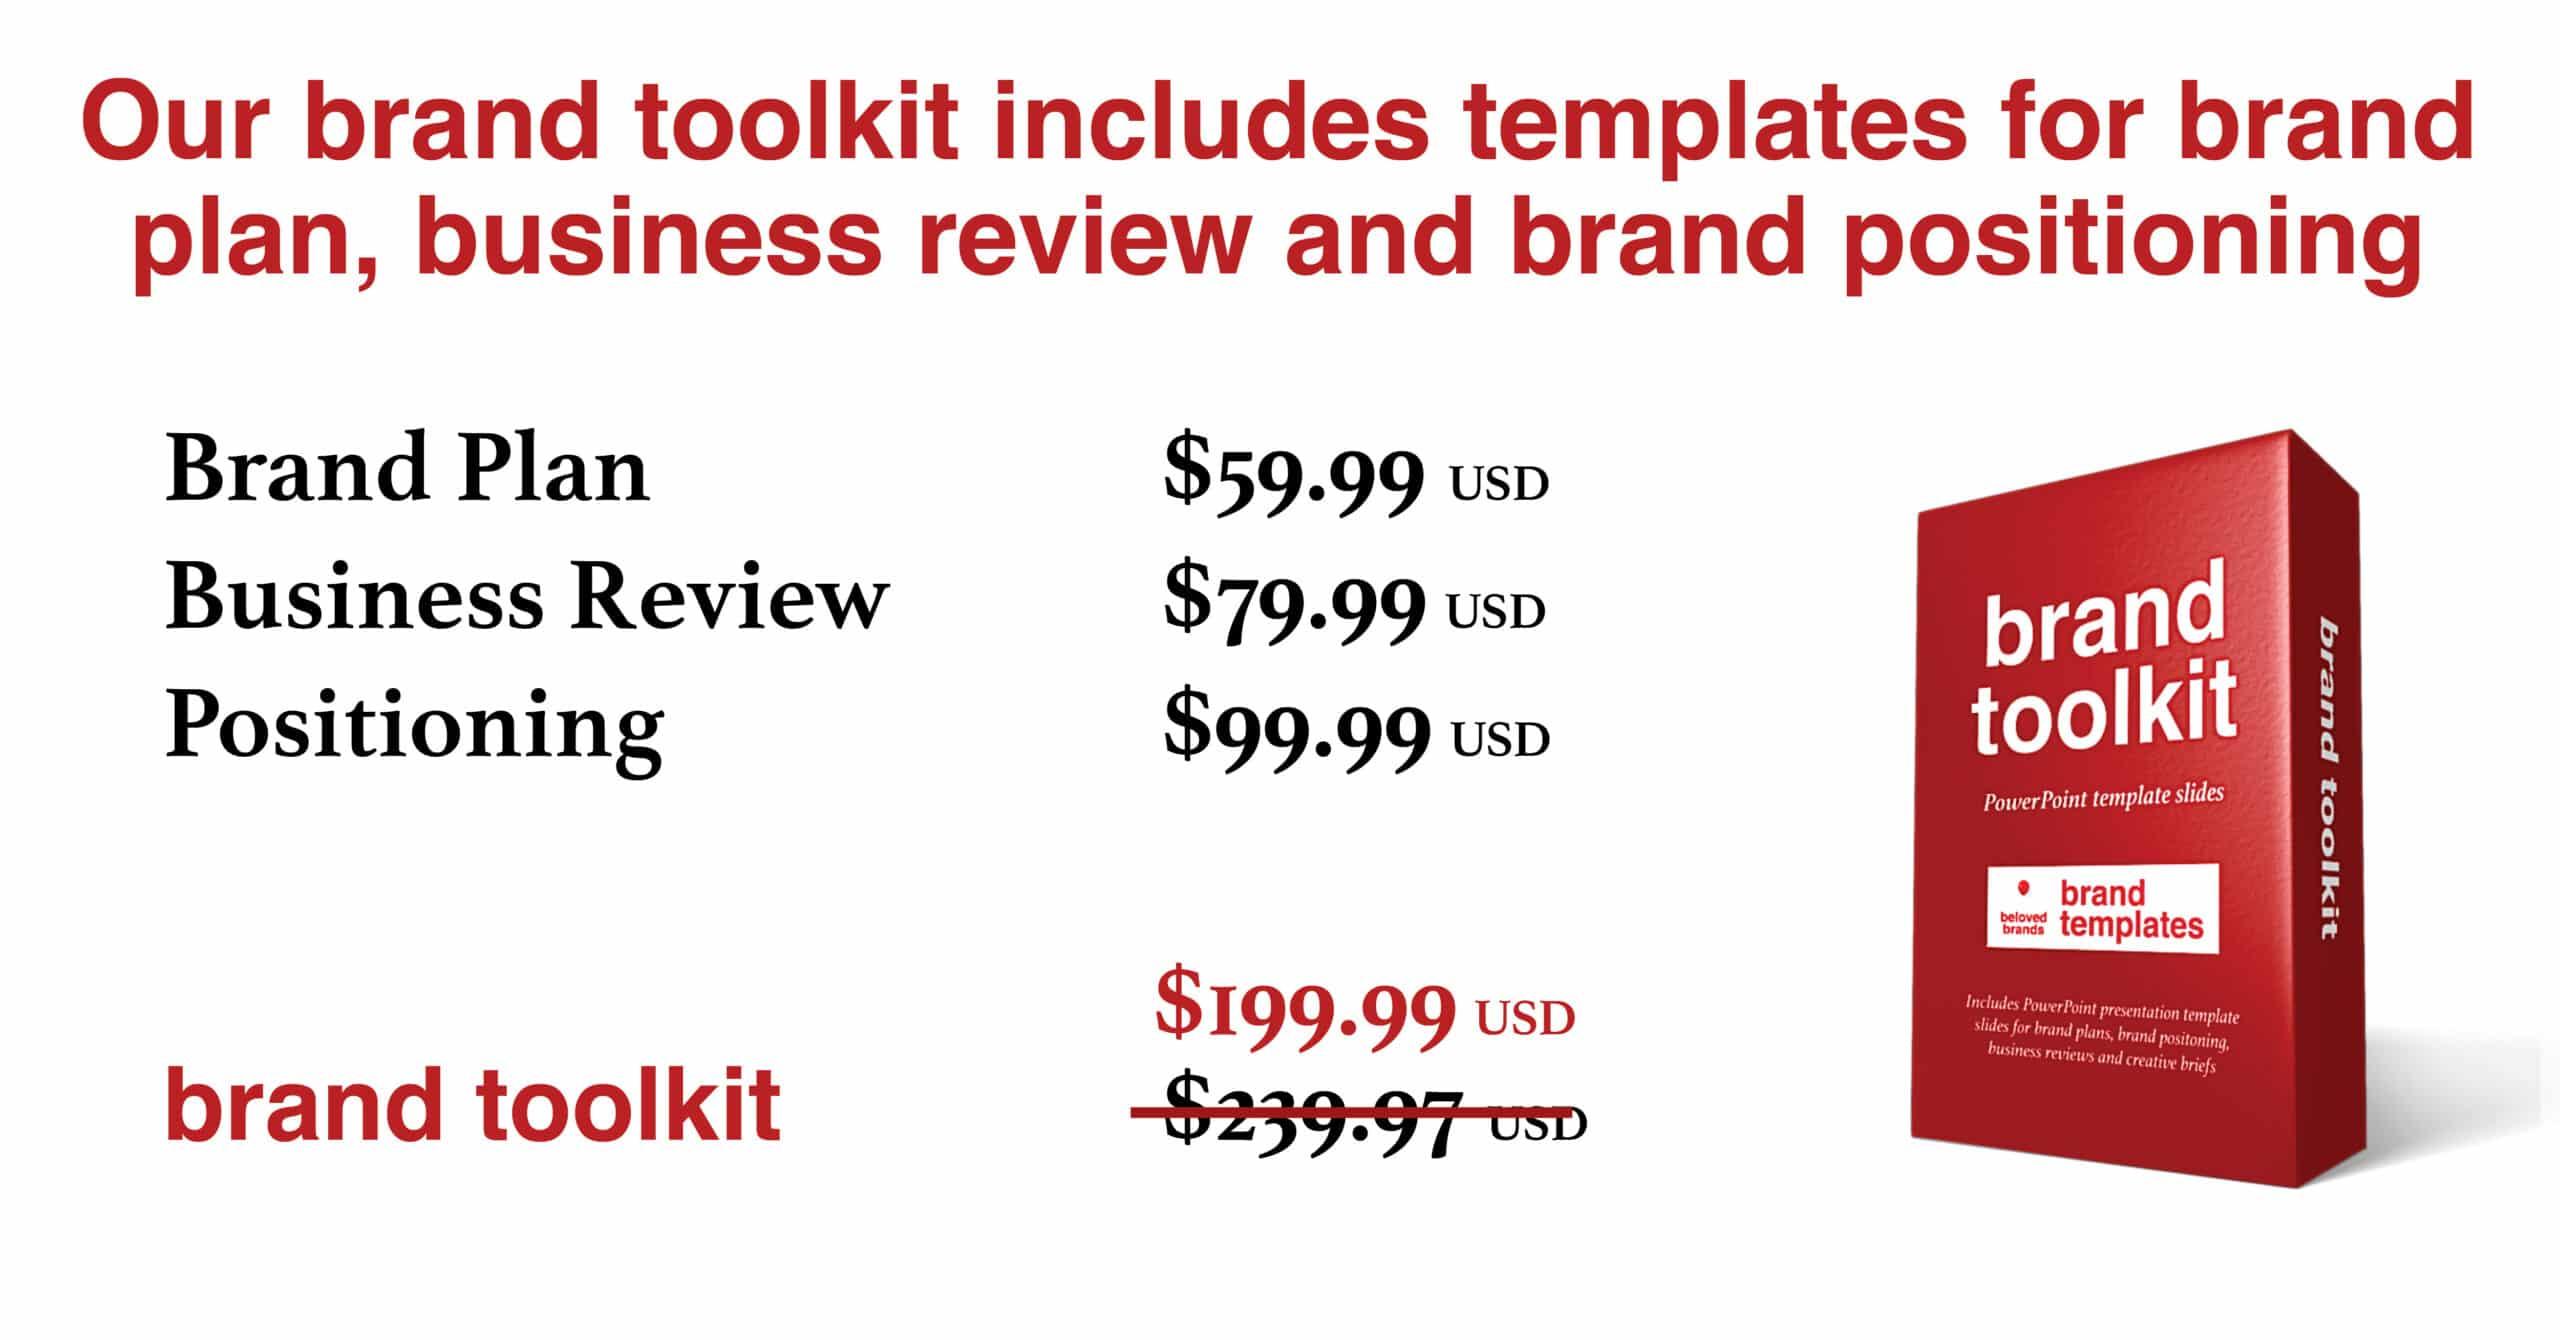 brand toolkit brand templates